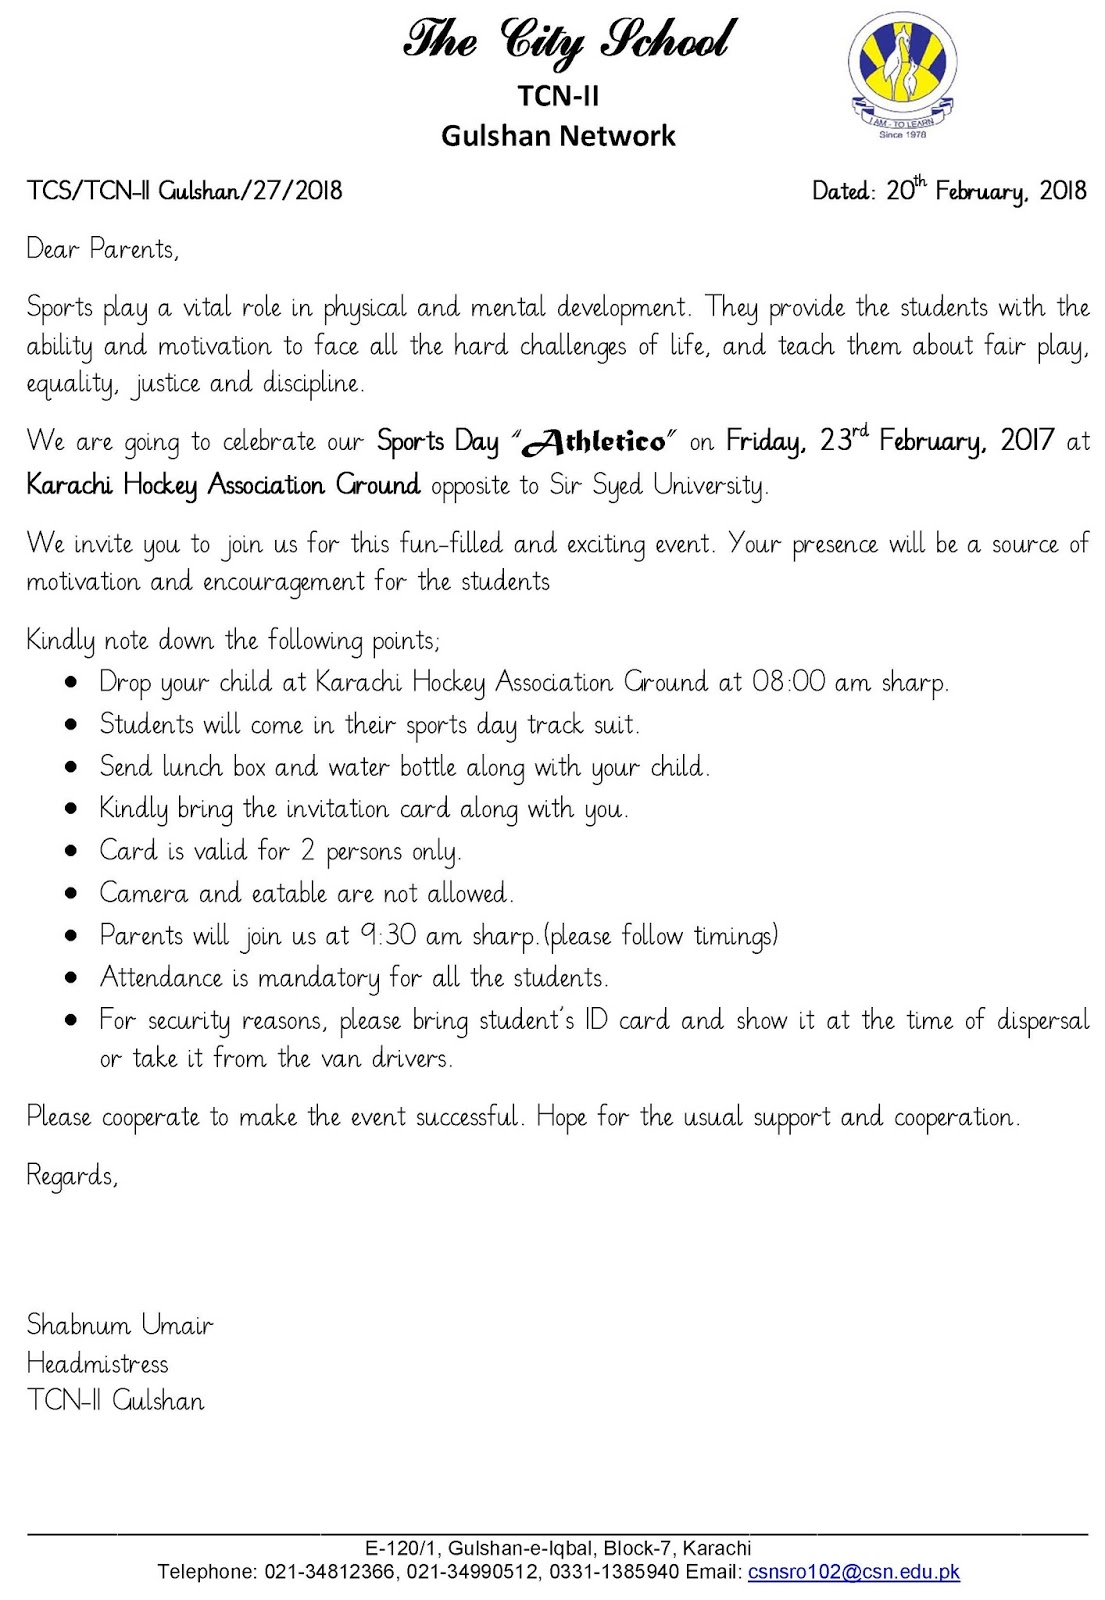 Sr gulshan the city nursery ii sports day invitation card and circular sports day invitation card and circular stopboris Gallery